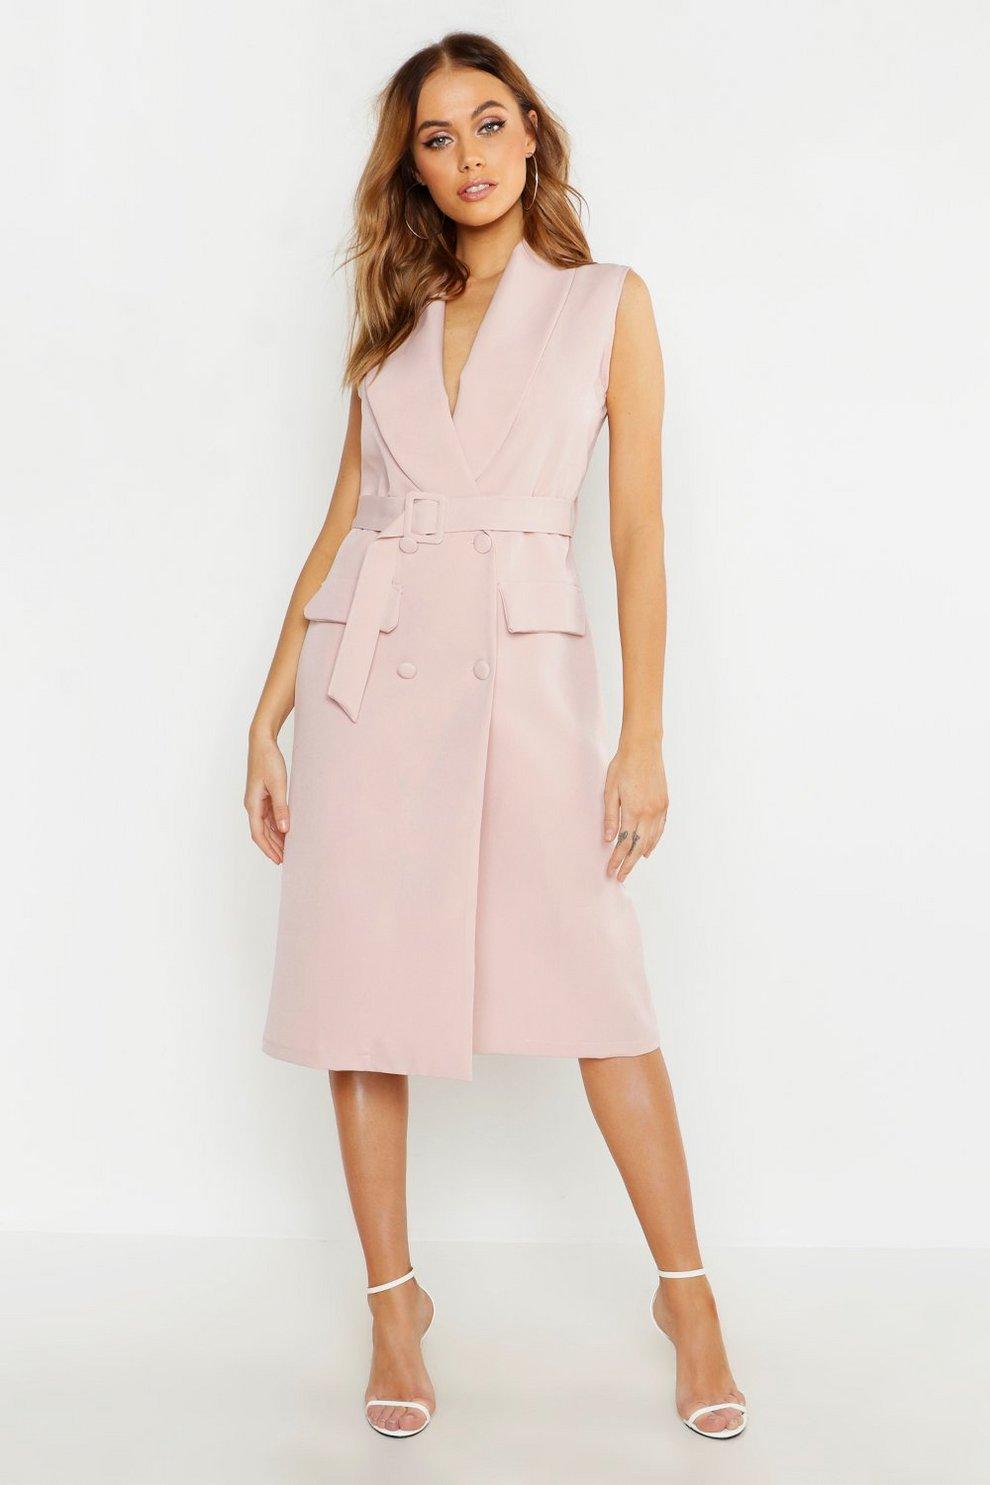 1a151dc8f7c0 Womens Soft pink Woven Midi Belted Blazer Dress